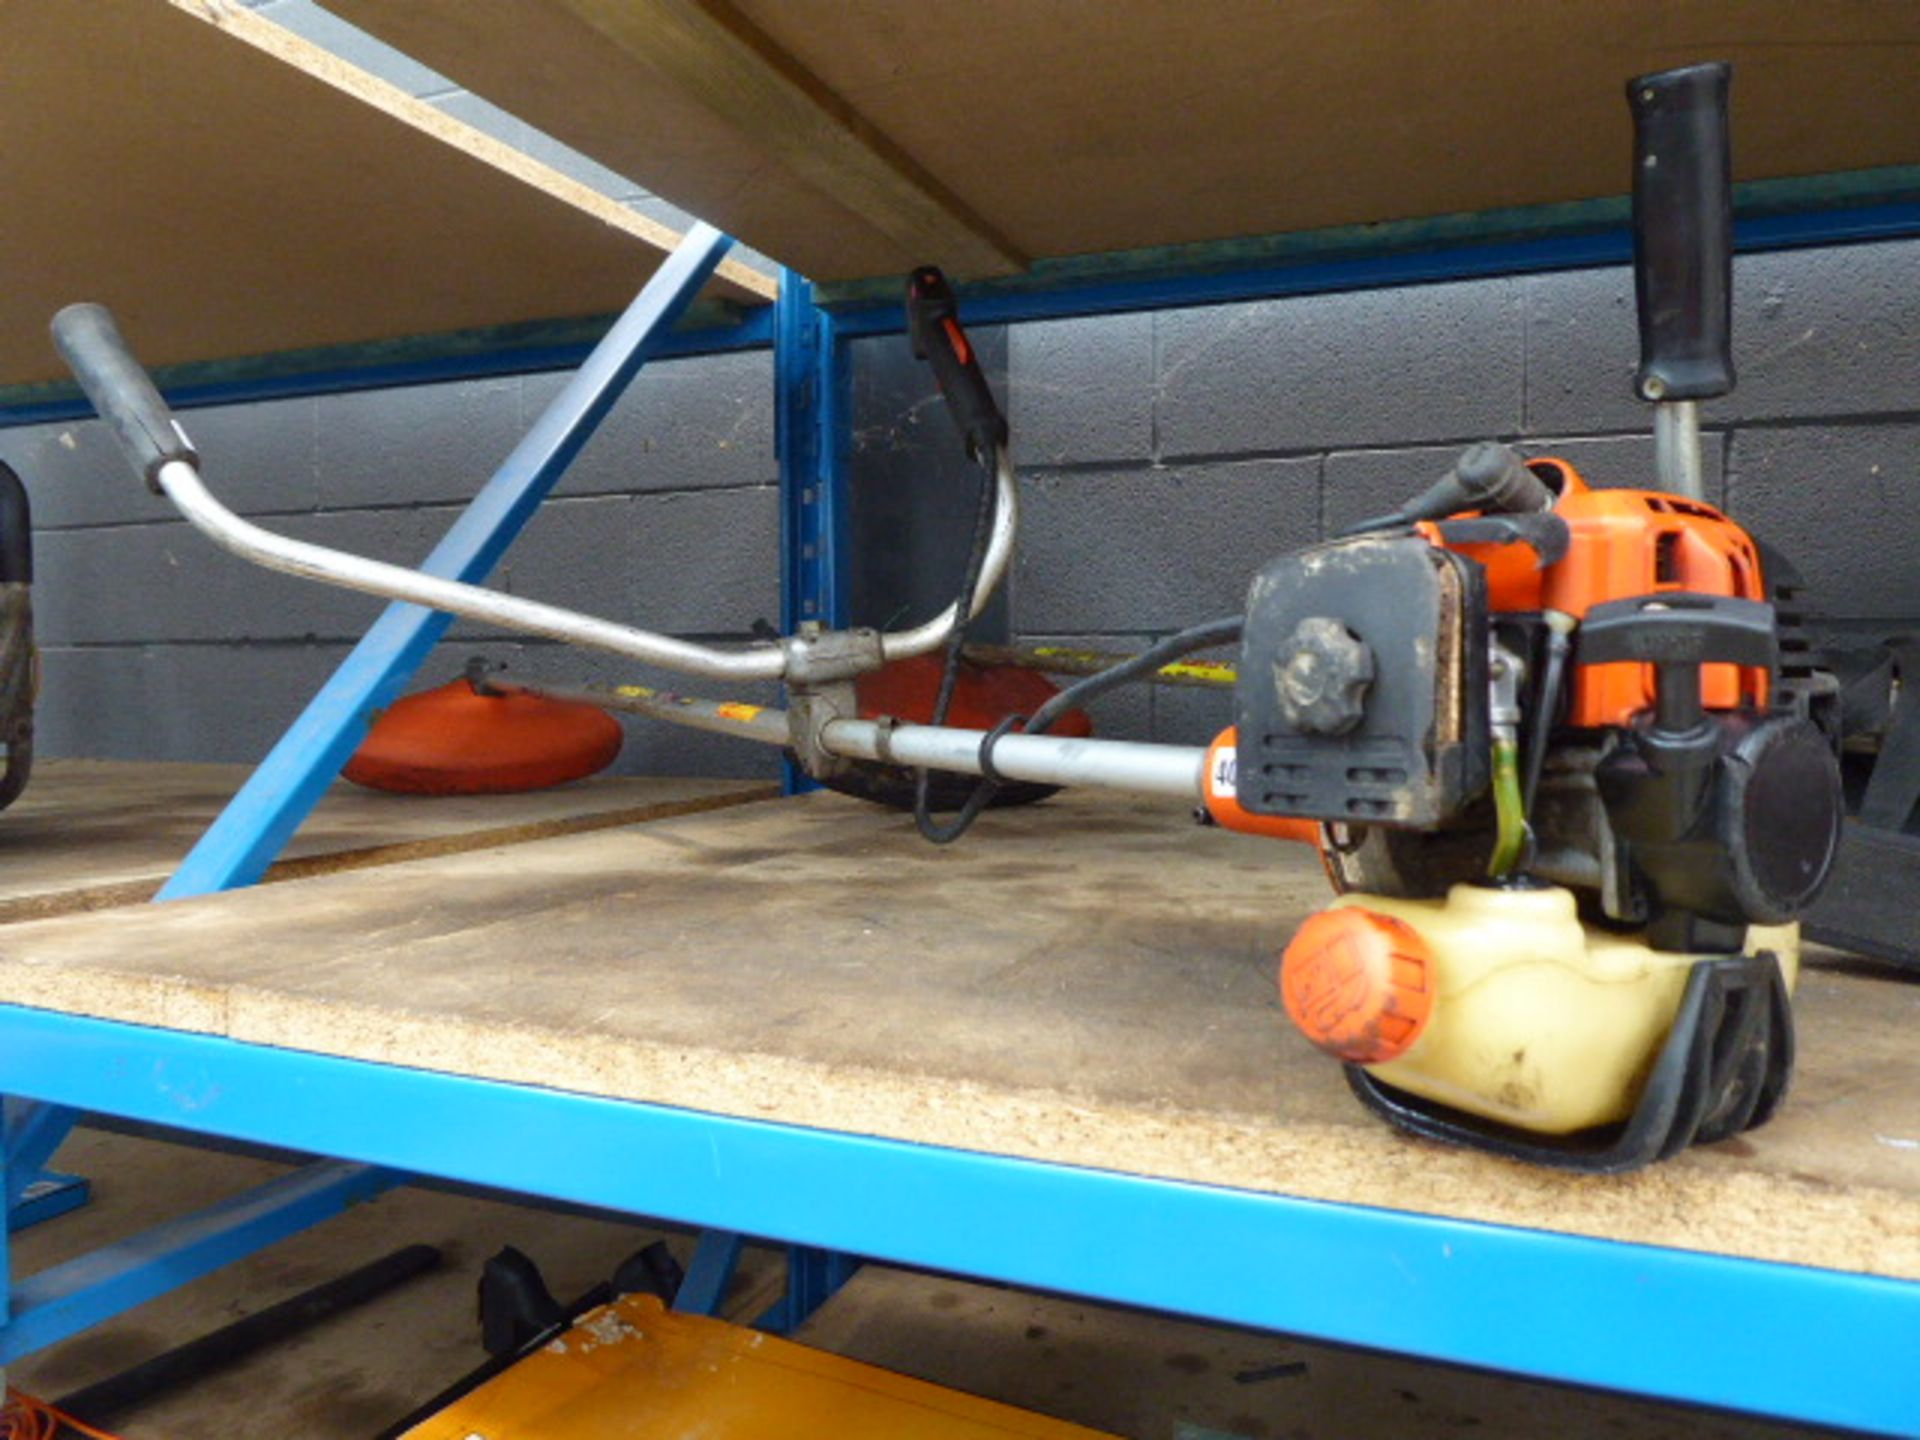 Lot 4054 - Echo petrol powered strimmer